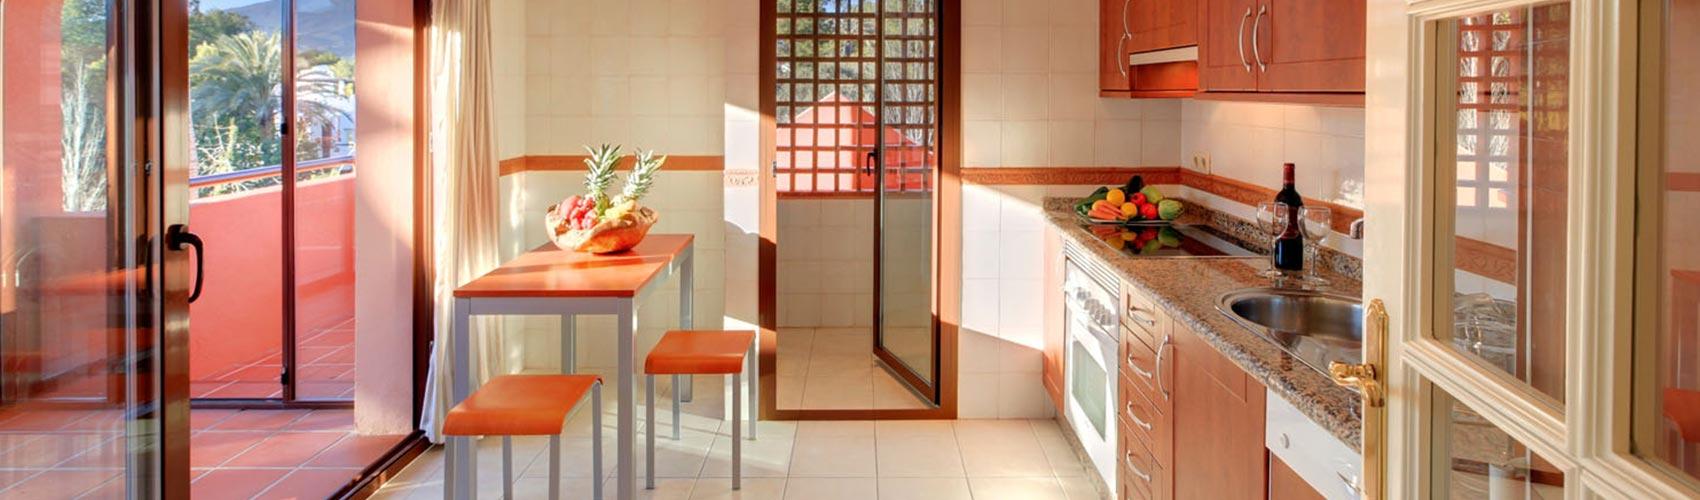 Property Rentals Alzambra-Vasari Puerto Banus